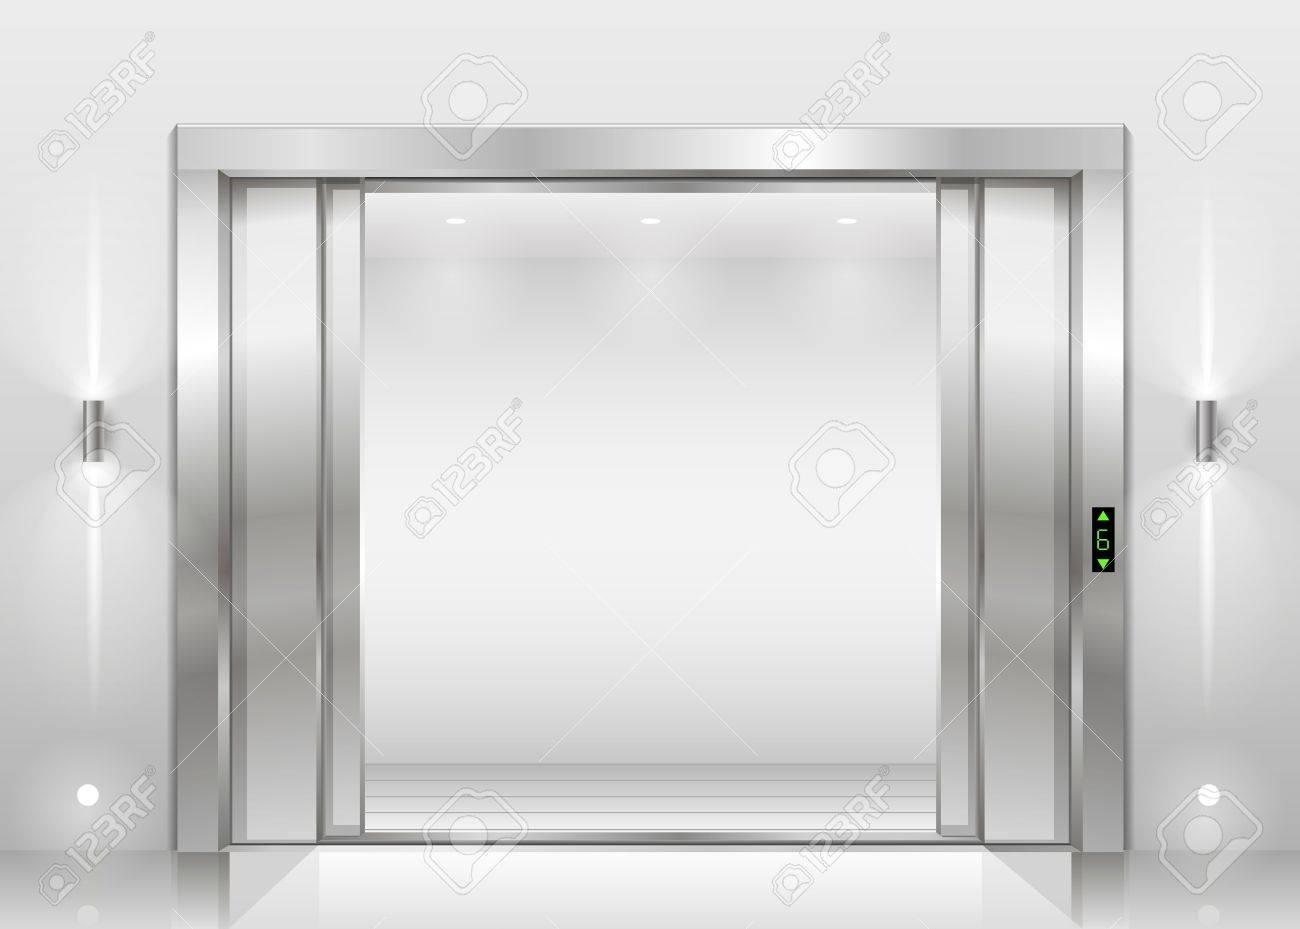 Open the door of the freight elevator hospital or office building. Metal armored sliding door  sc 1 st  123RF.com & Open The Door Of The Freight Elevator Hospital Or Office Building ...